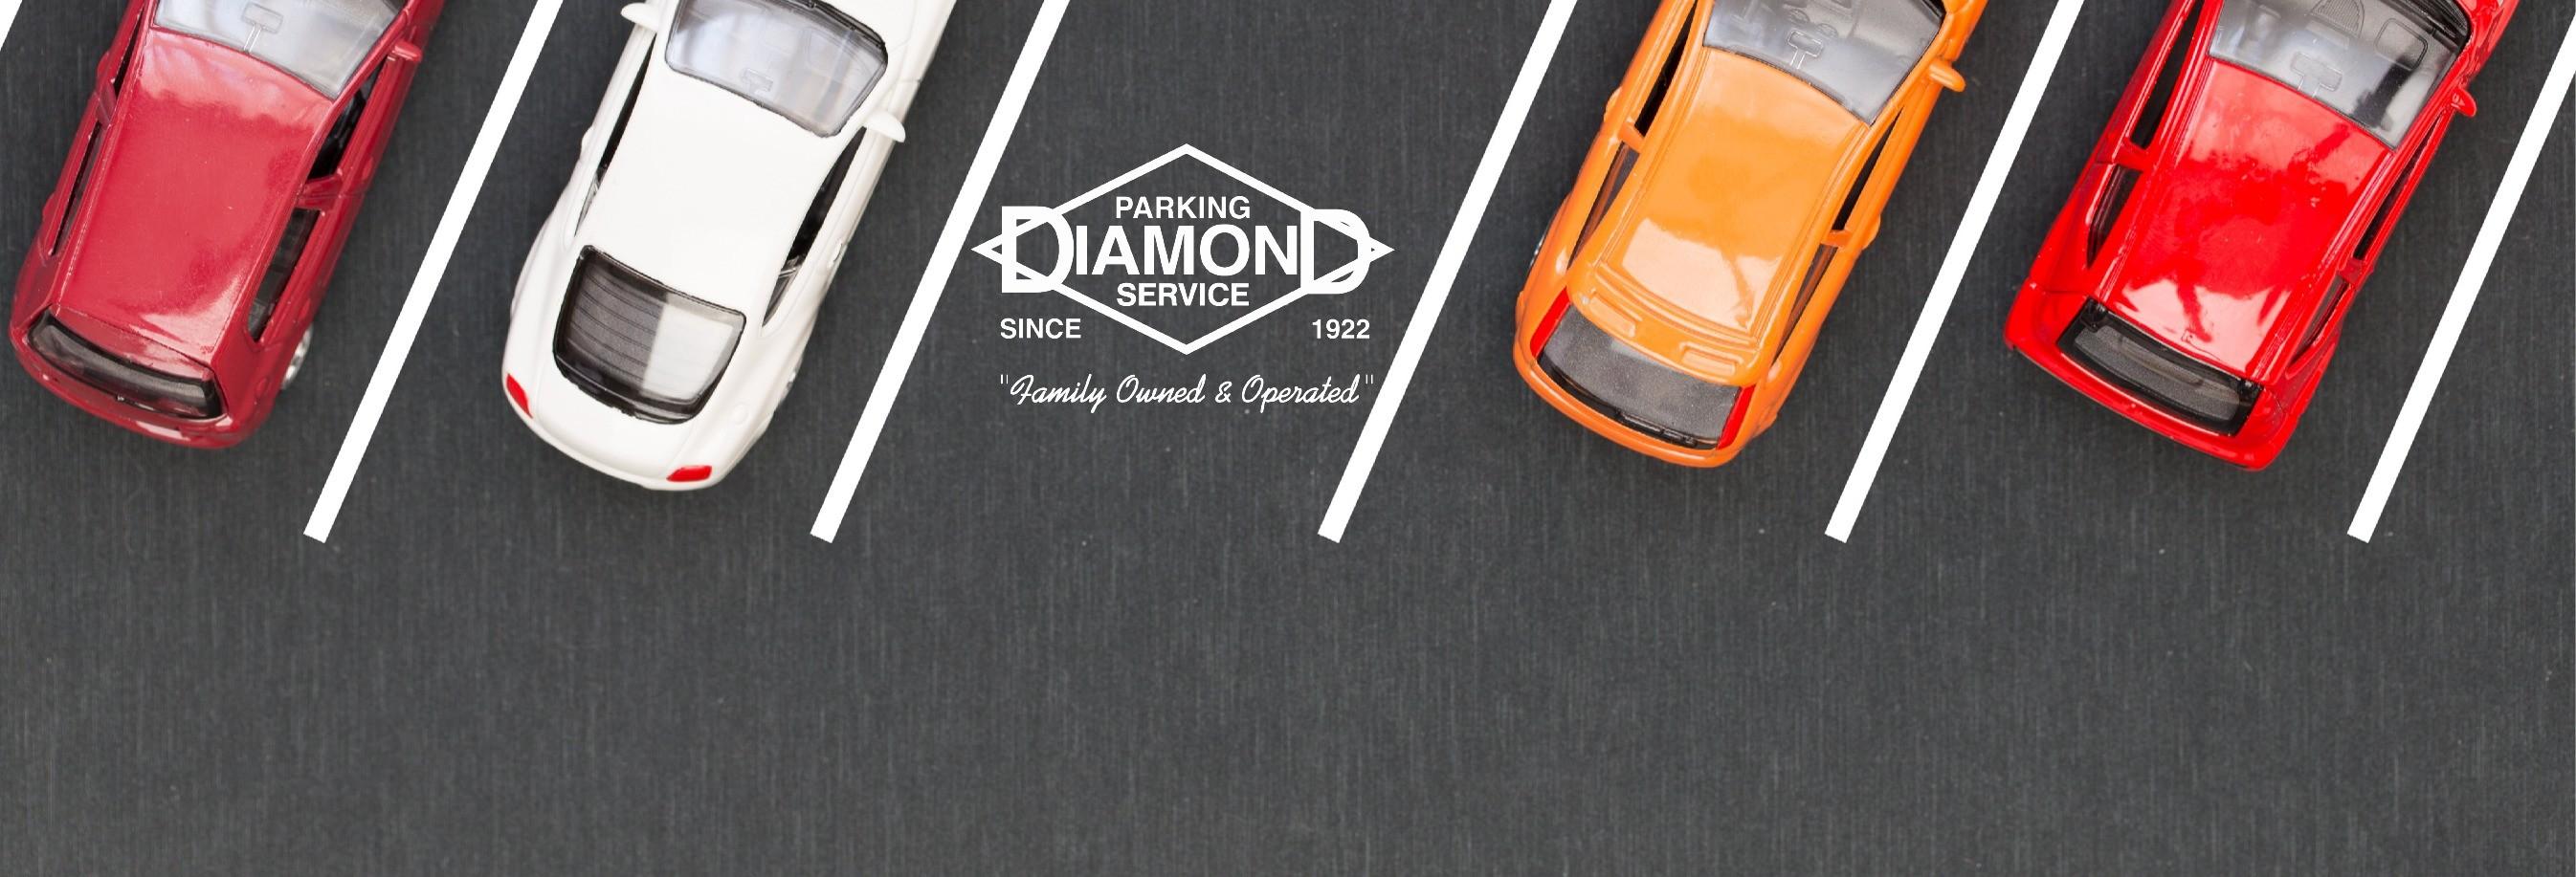 Diamond Parking Service